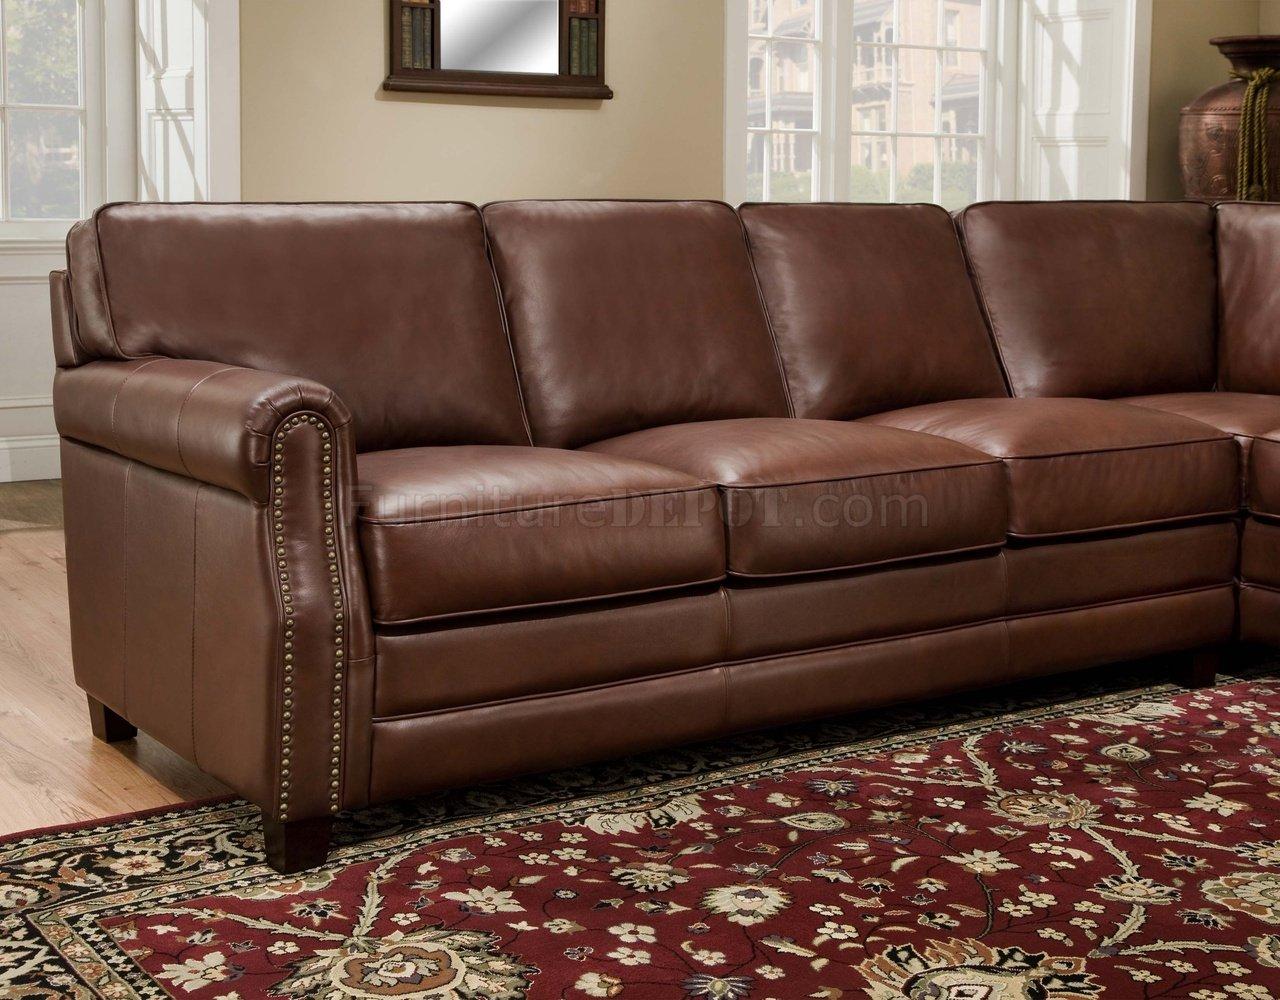 classic italian leather sofa o kitty cocoa brown top grain traditional